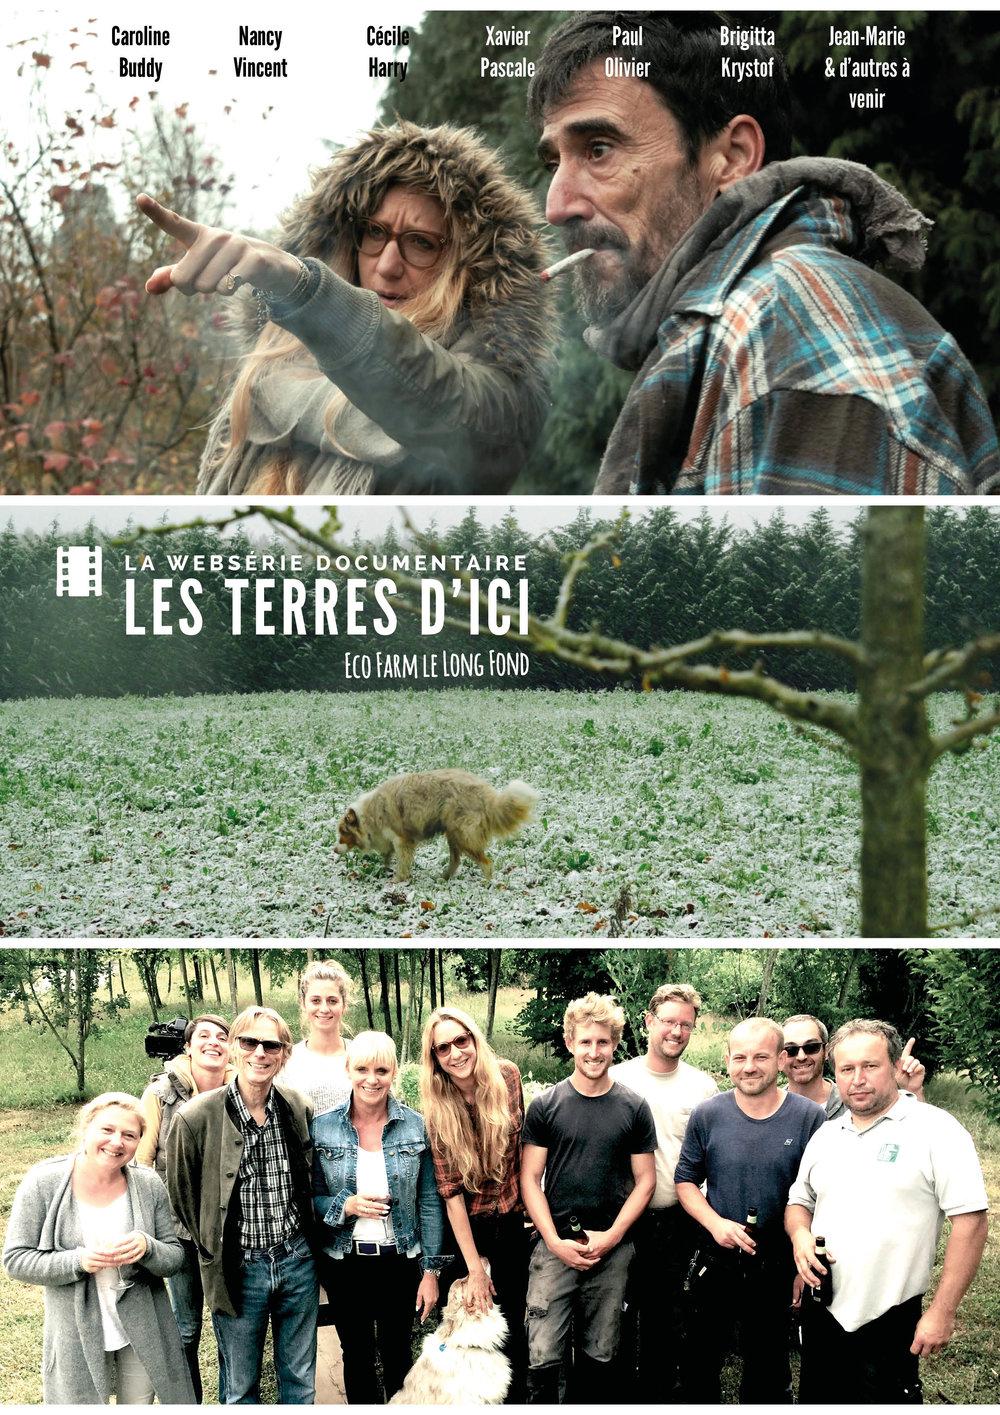 photo-ferme-ecologie-webserie-belgique-bio-permaculture-pepiniere.jpg